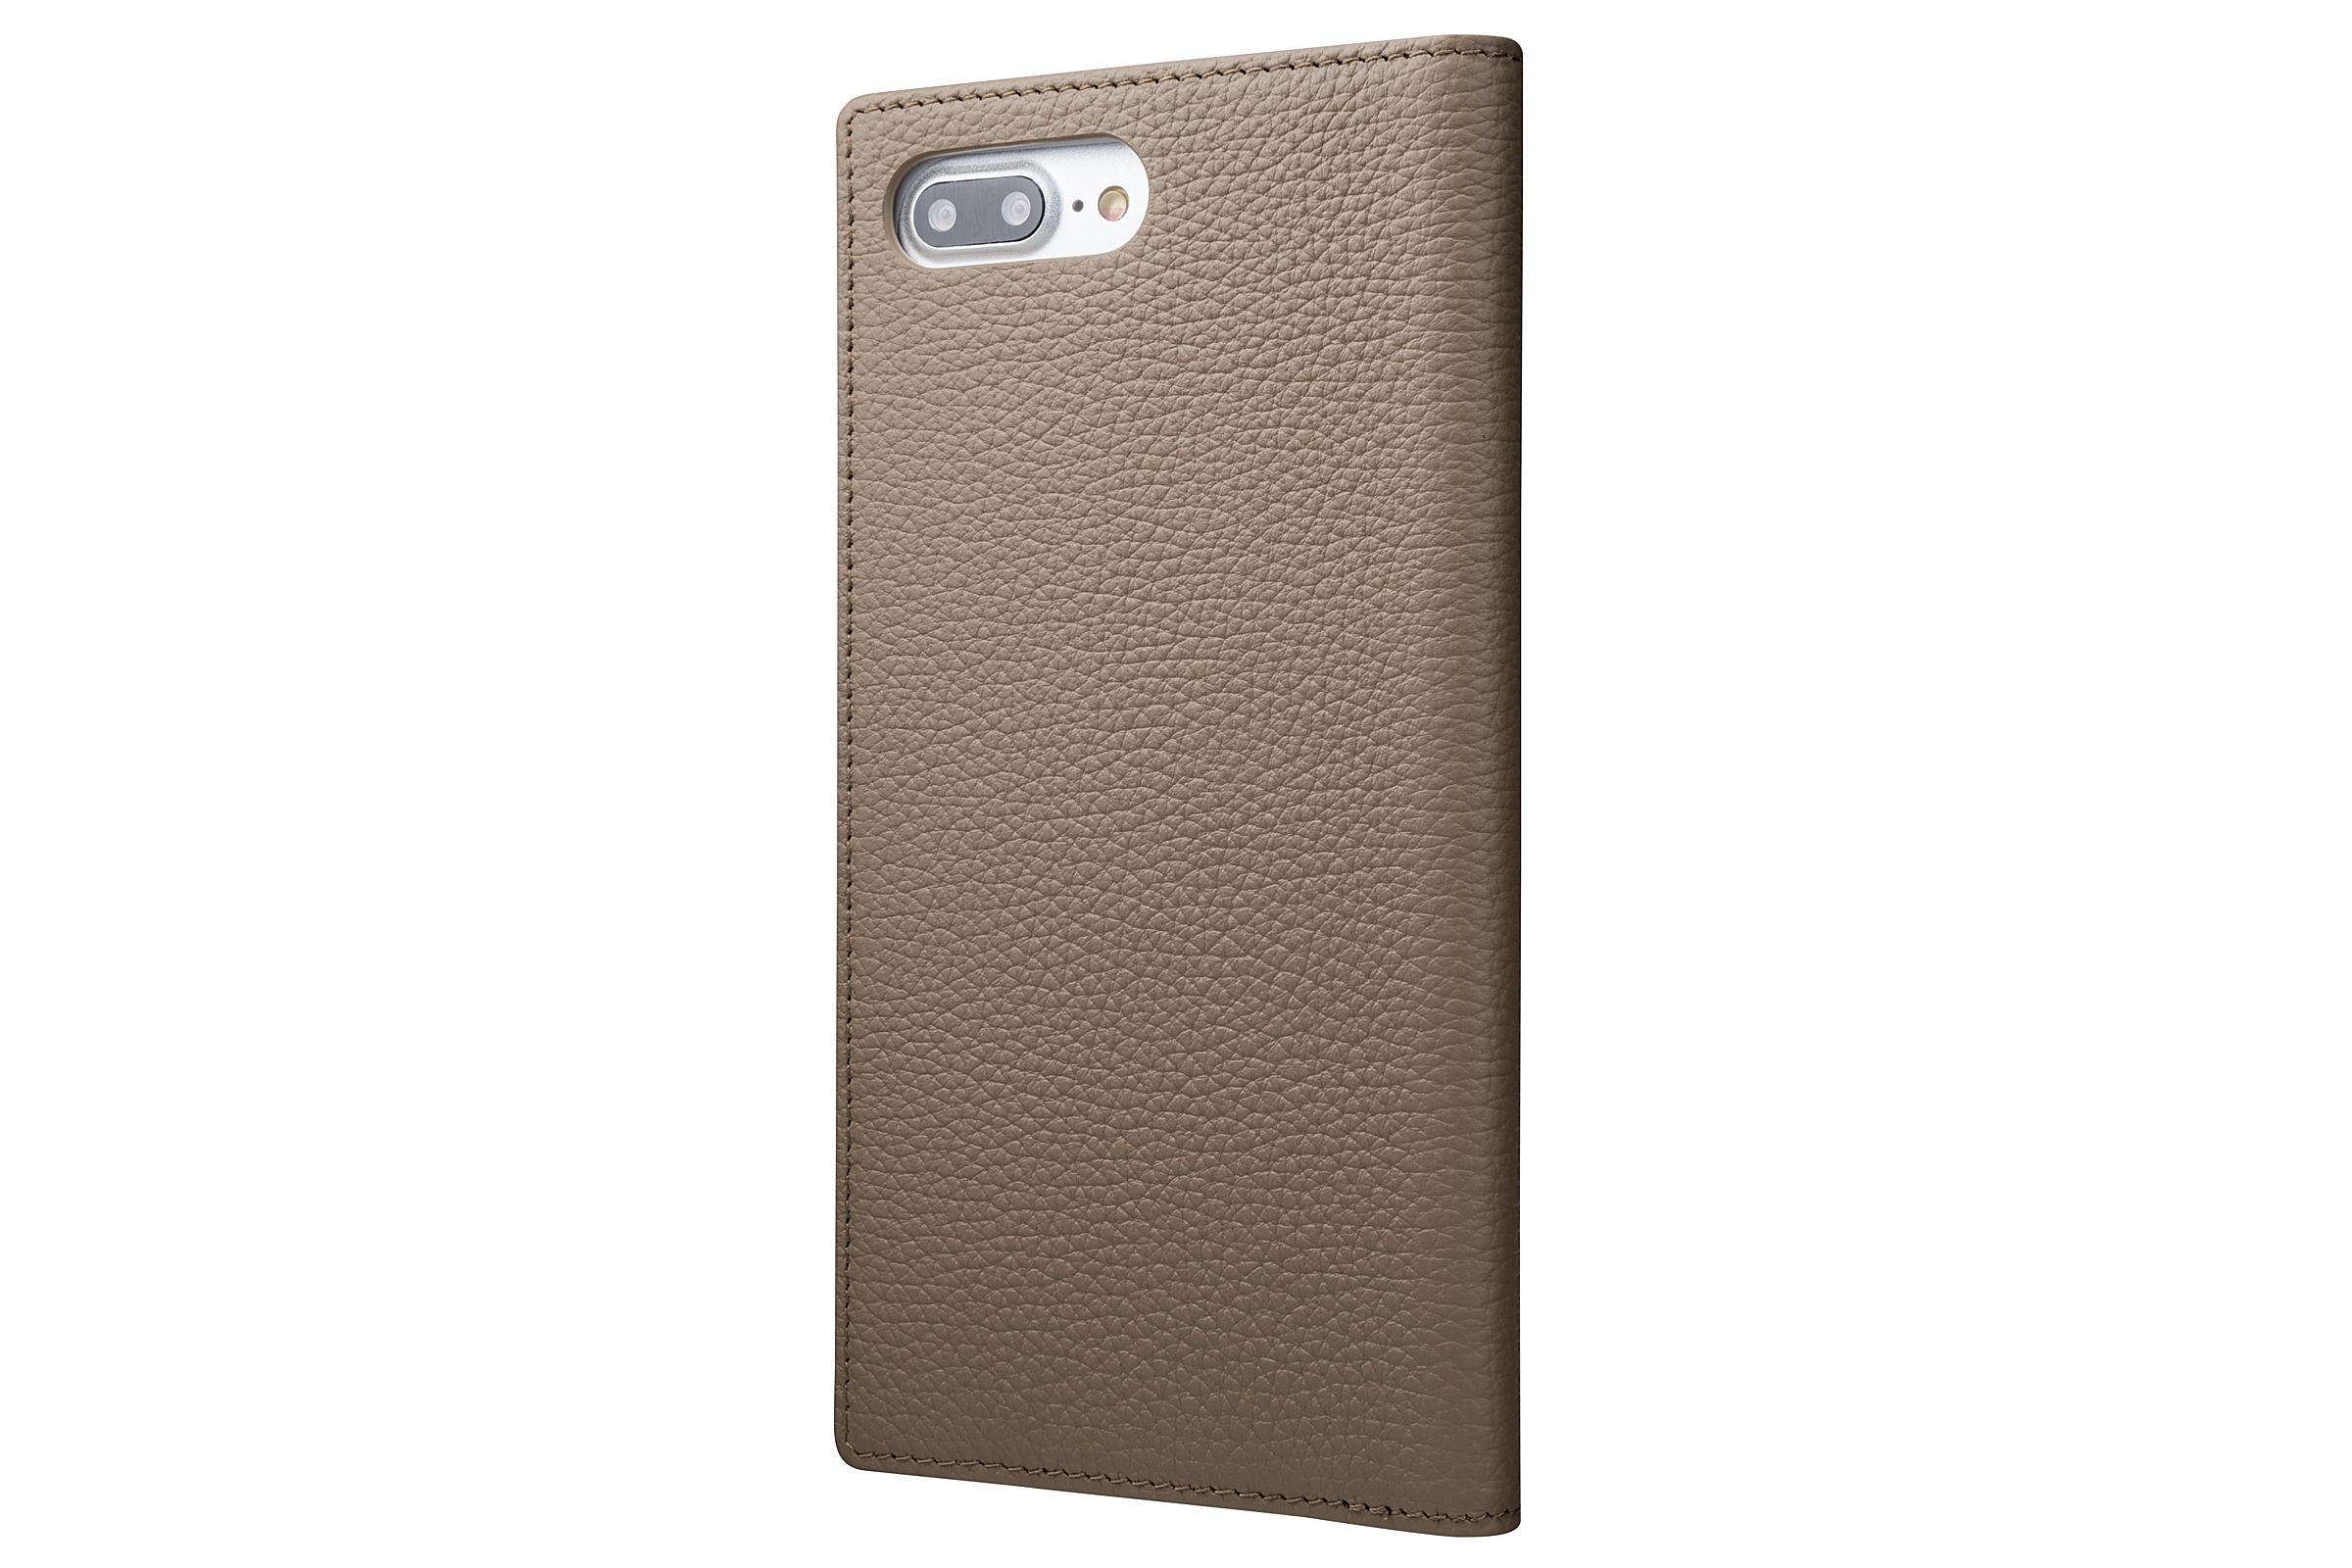 GRAMAS Shrunken-calf Full Leather Case for iPhone 7 Plus(Taupe(トープ)) シュランケンカーフ 手帳型フルレザーケース - 画像2